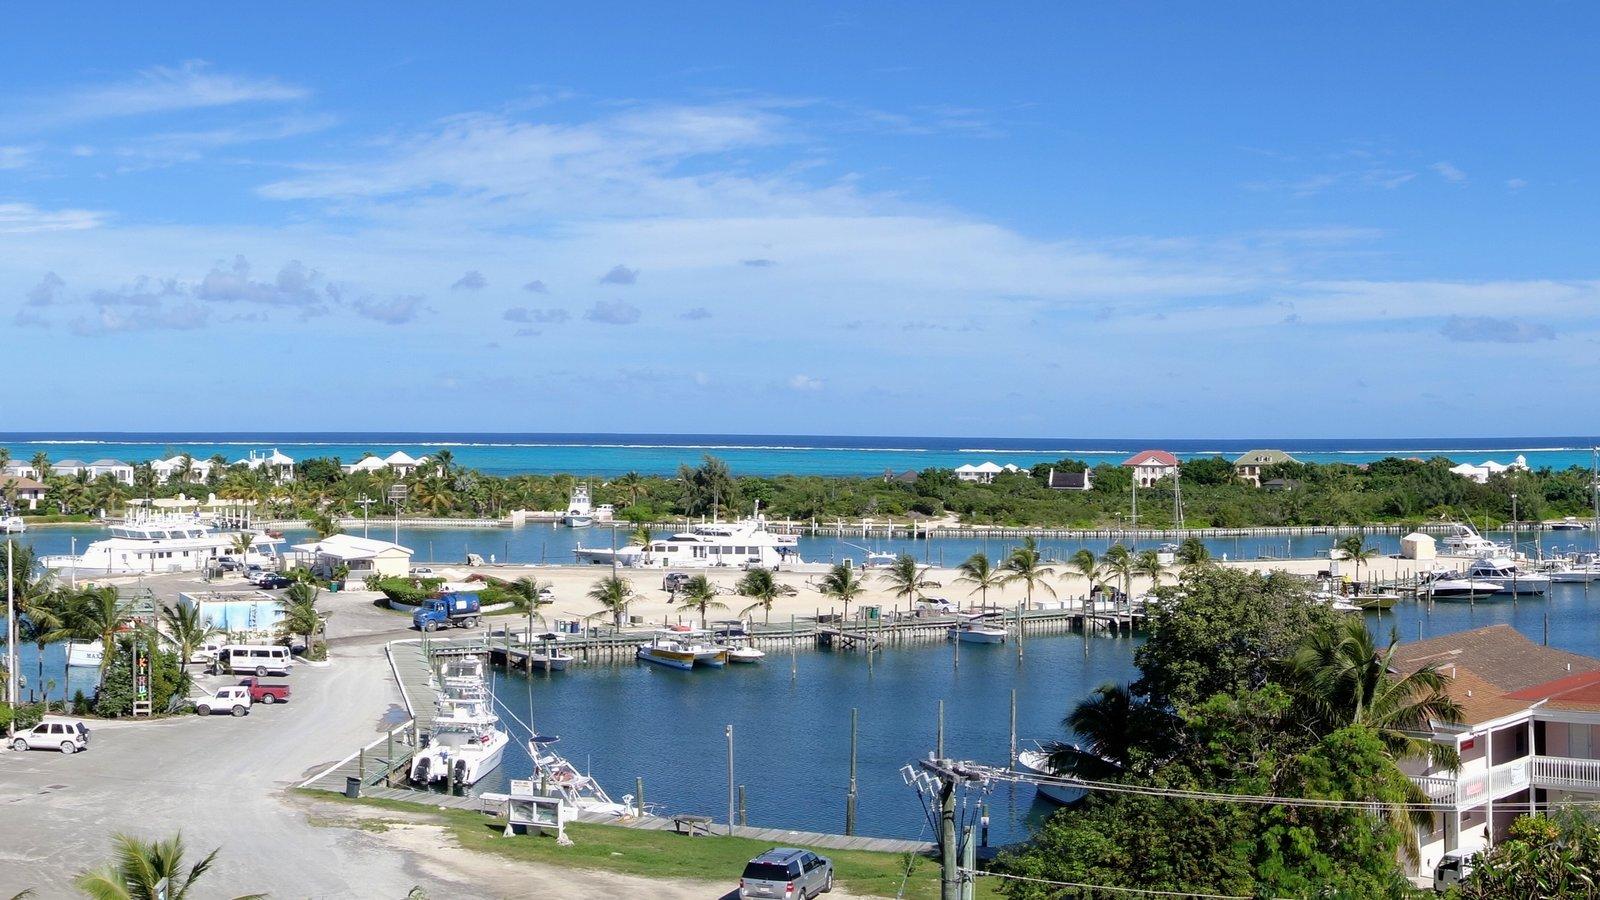 Turtle Cove featuring a marina and a coastal town